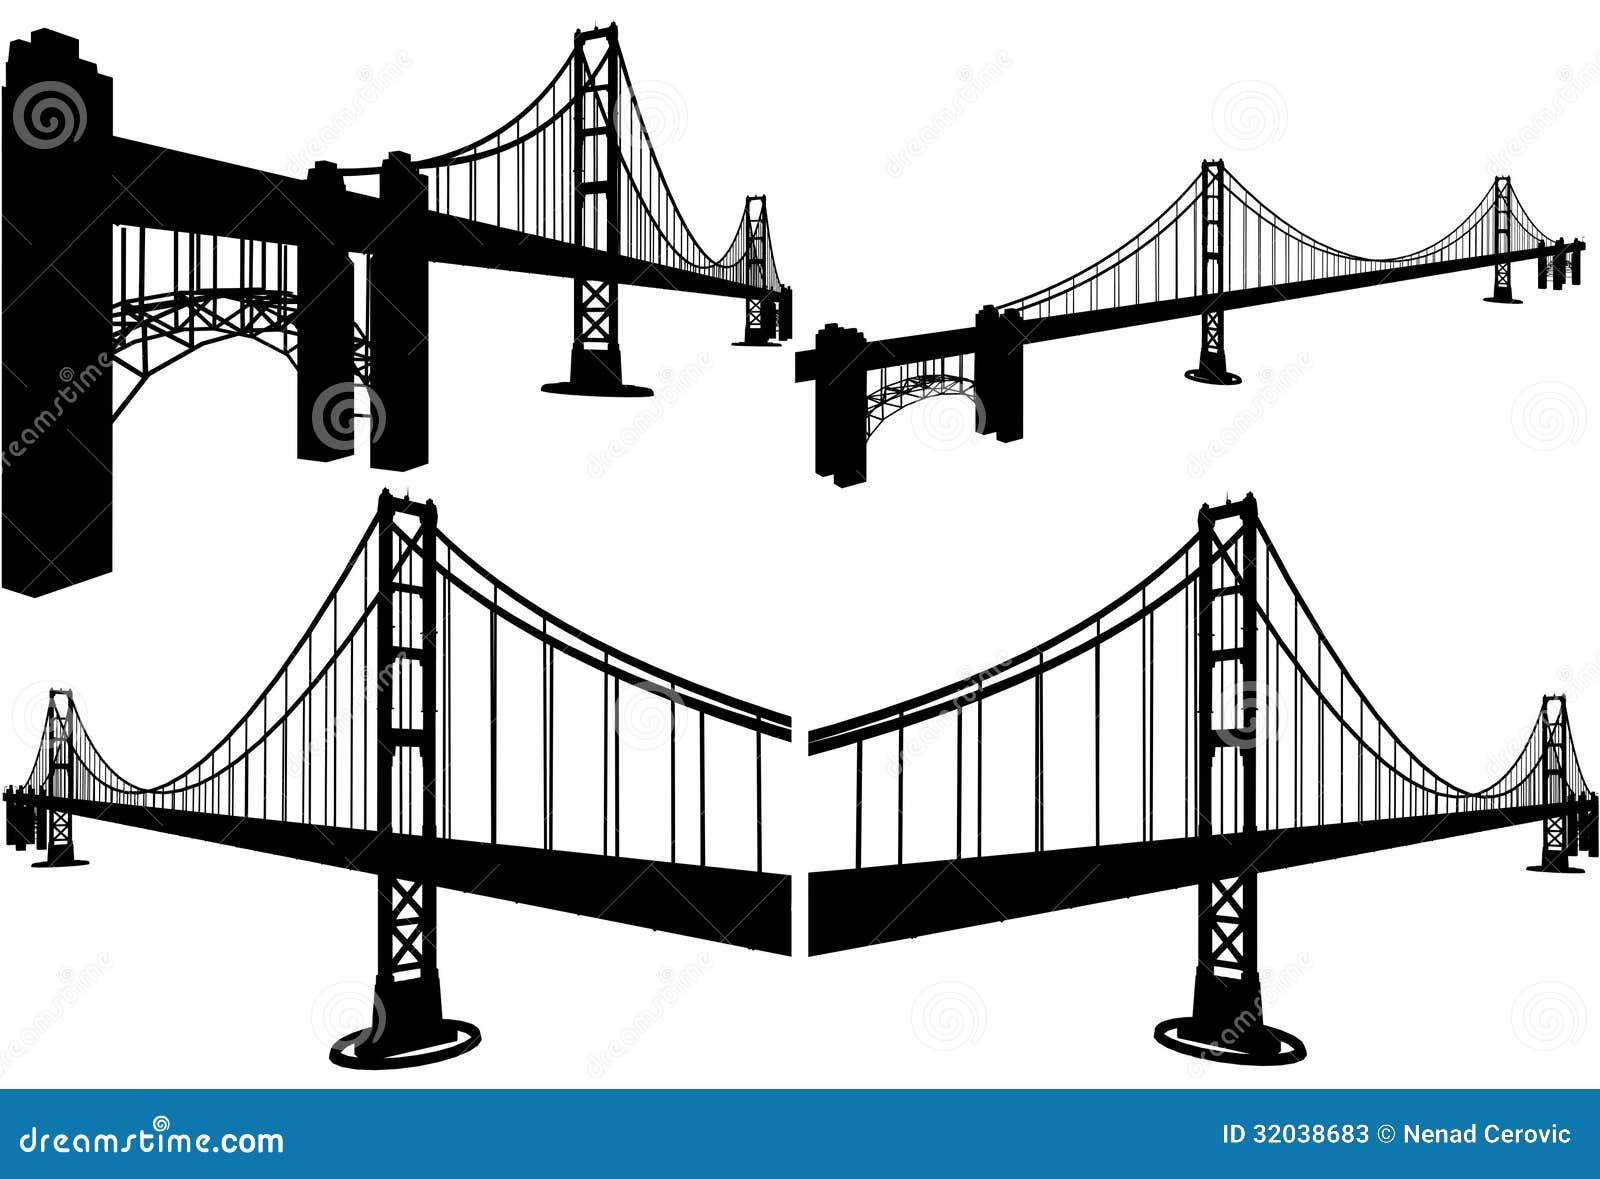 The Bridge Silhouettes Vector 07 Stock Photos - Image ...